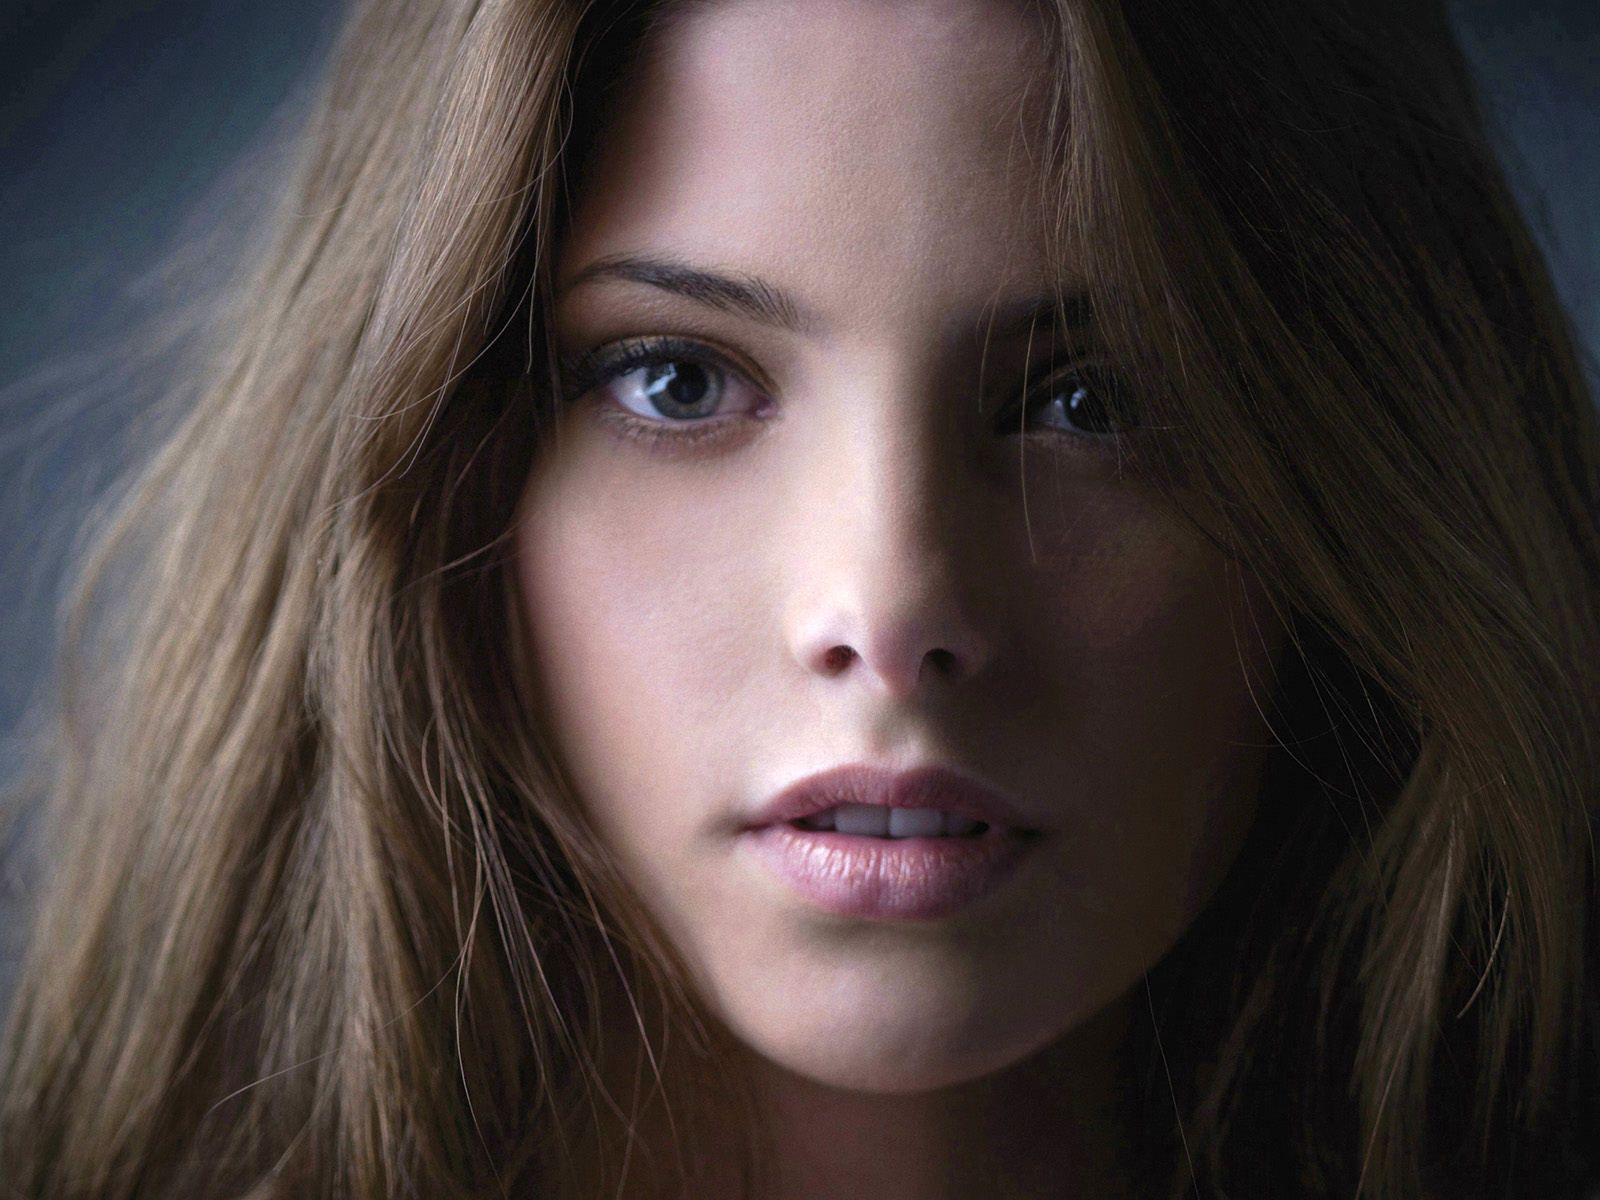 Beautiful Girl Face Hd Desktop Wallpaper Ashley Greene Wallpapers Wallpaper Cave